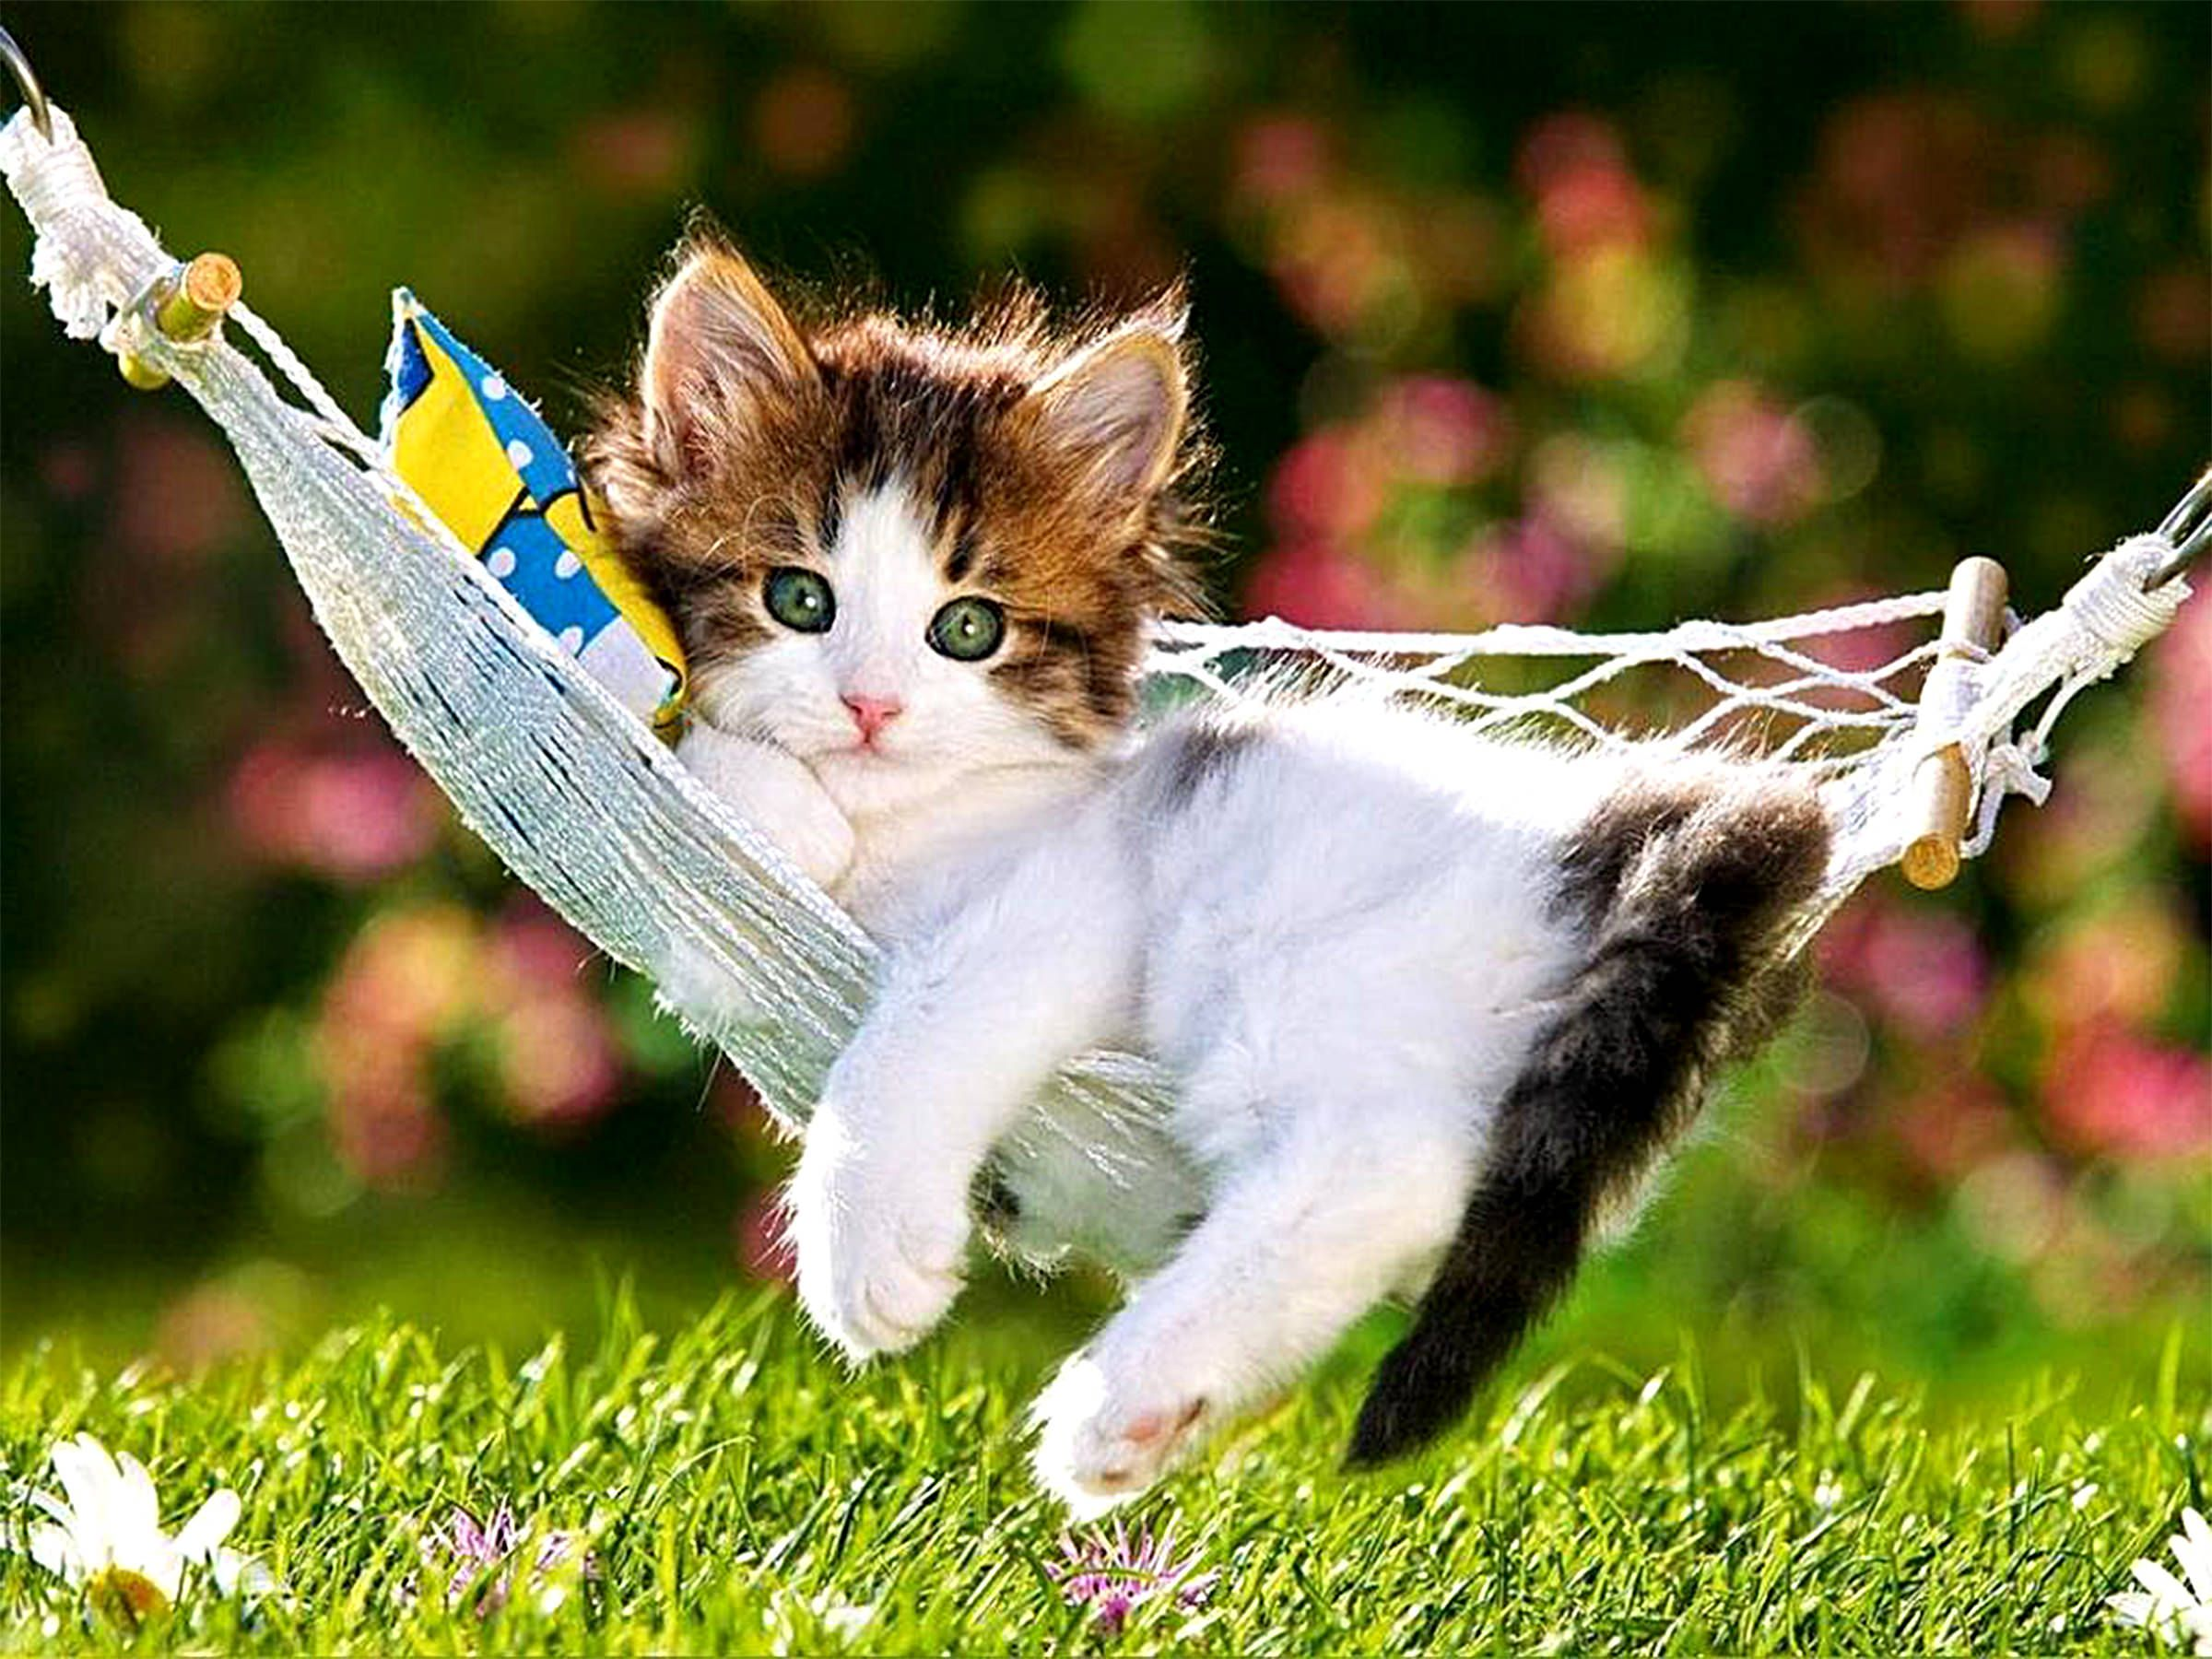 Aww So Cute 19201080 Full Resulotionhttps I Imgur Com Ualsb0f Jpg Kittens Cutest Funny Cute Cats Cute Cat Wallpaper